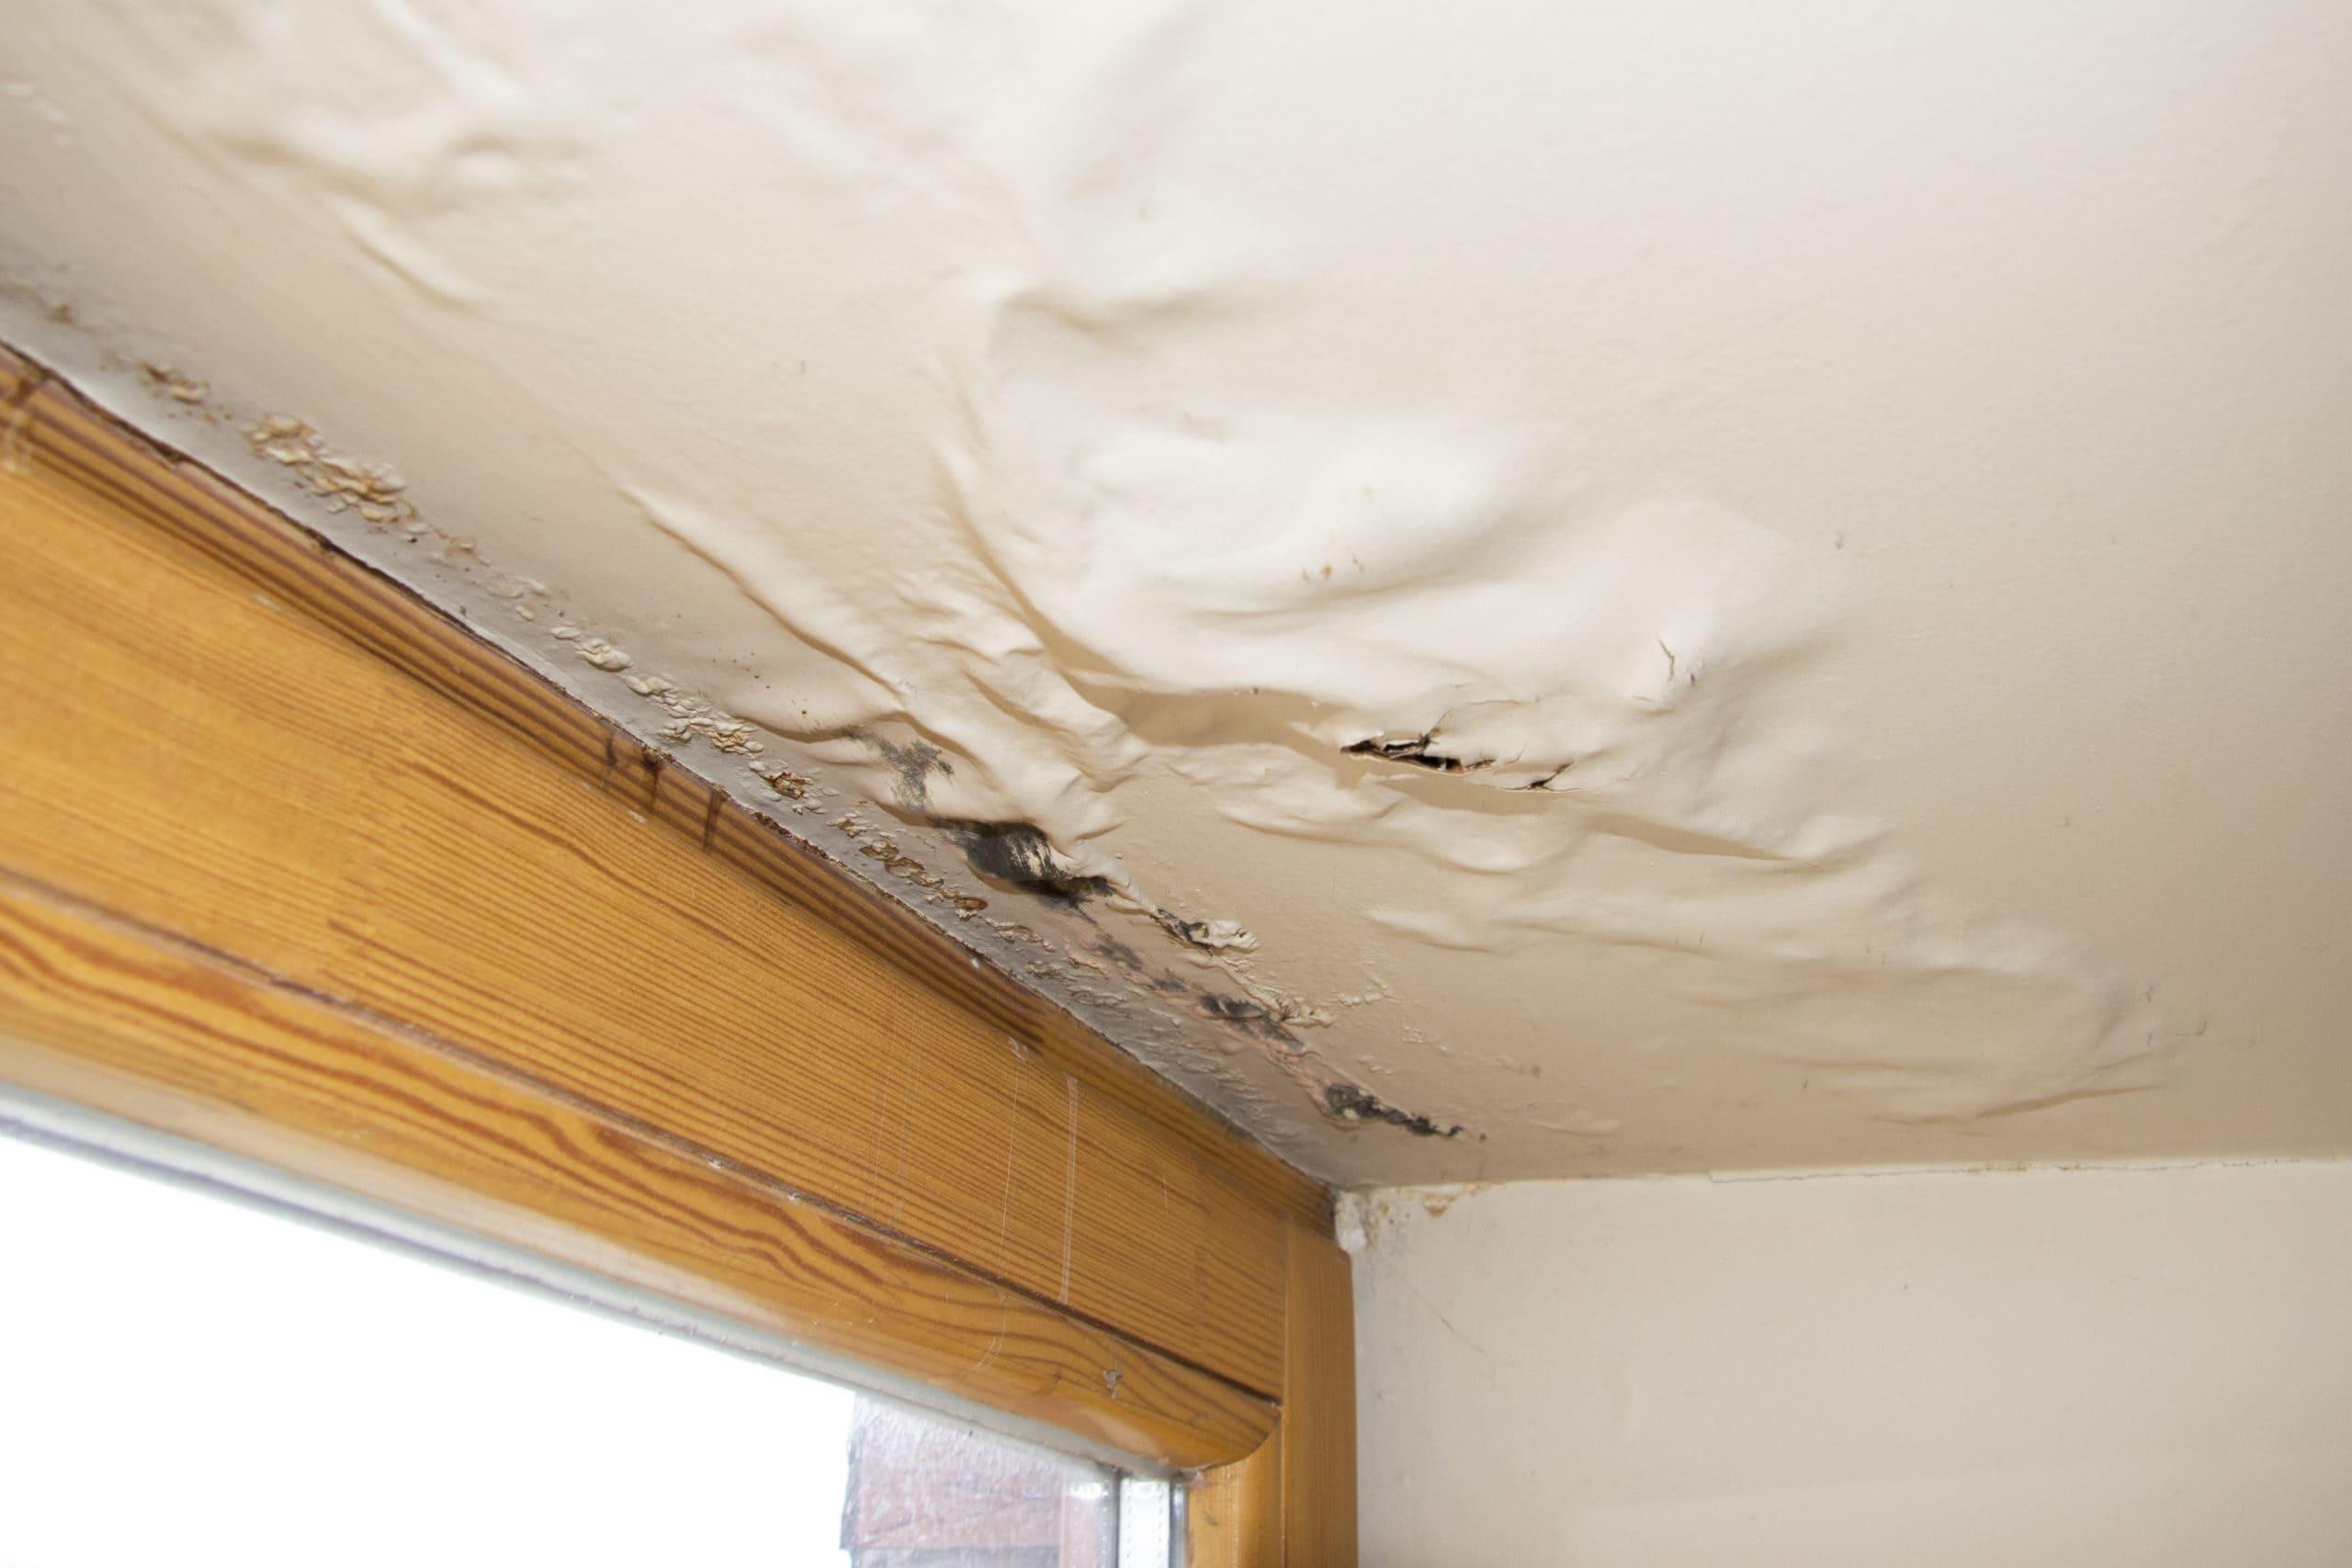 roof leak ceiling sagging